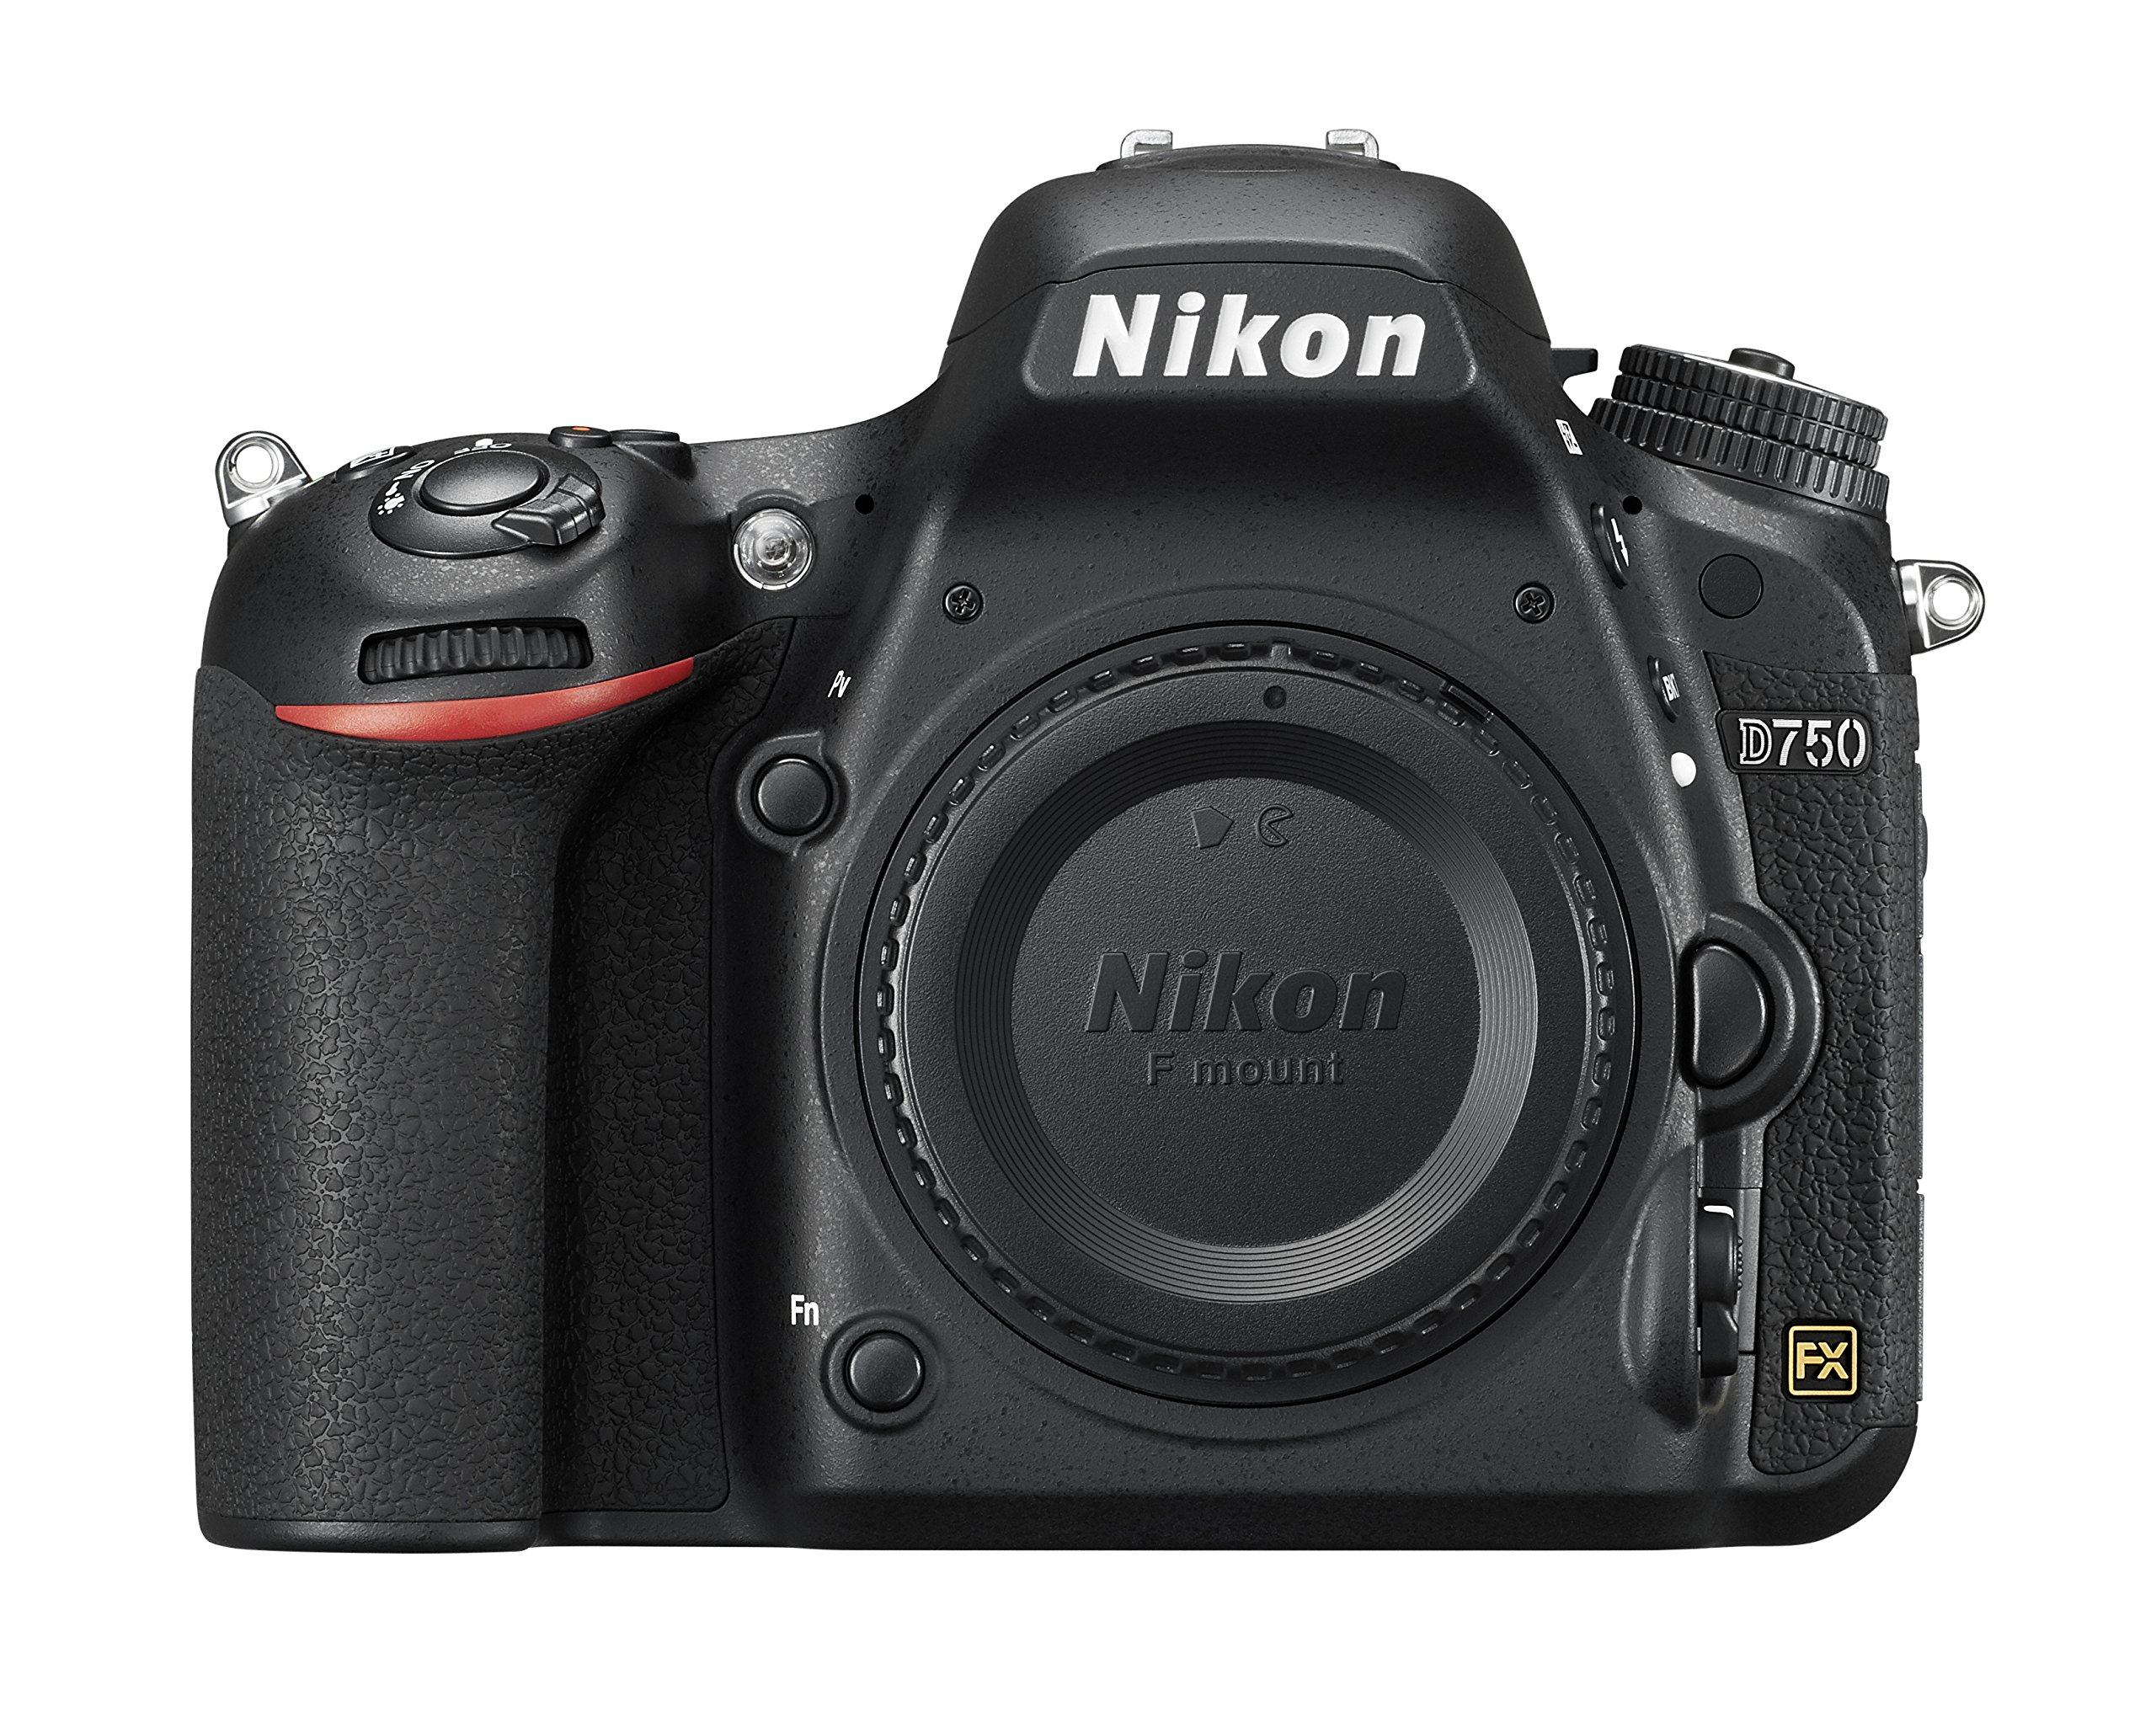 Nikon D750 FX-format Digital SLR Camera Body by Nikon